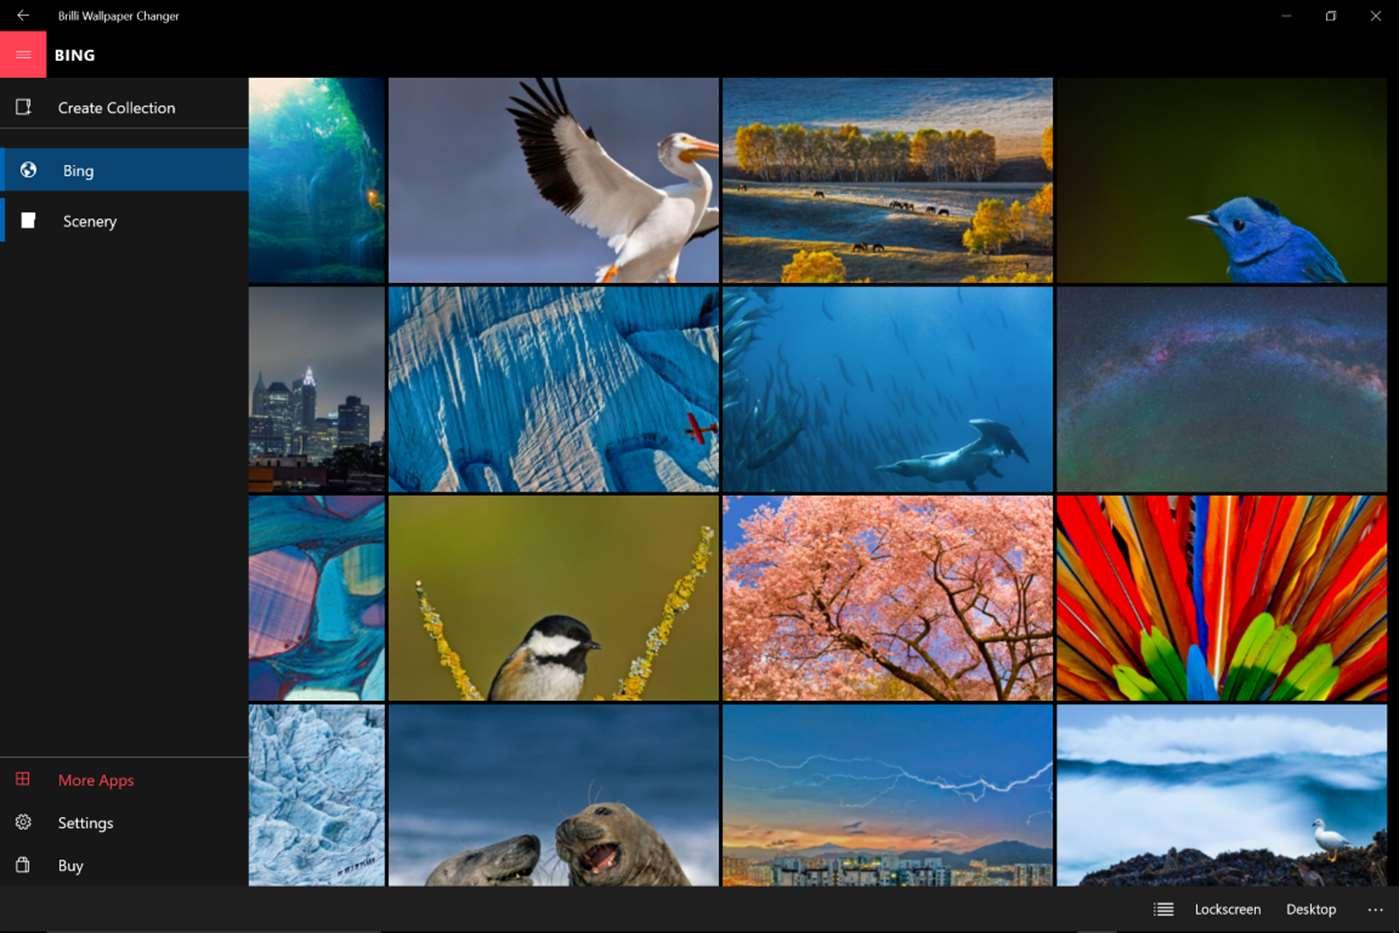 Best Wallpaper Apps For Windows 10